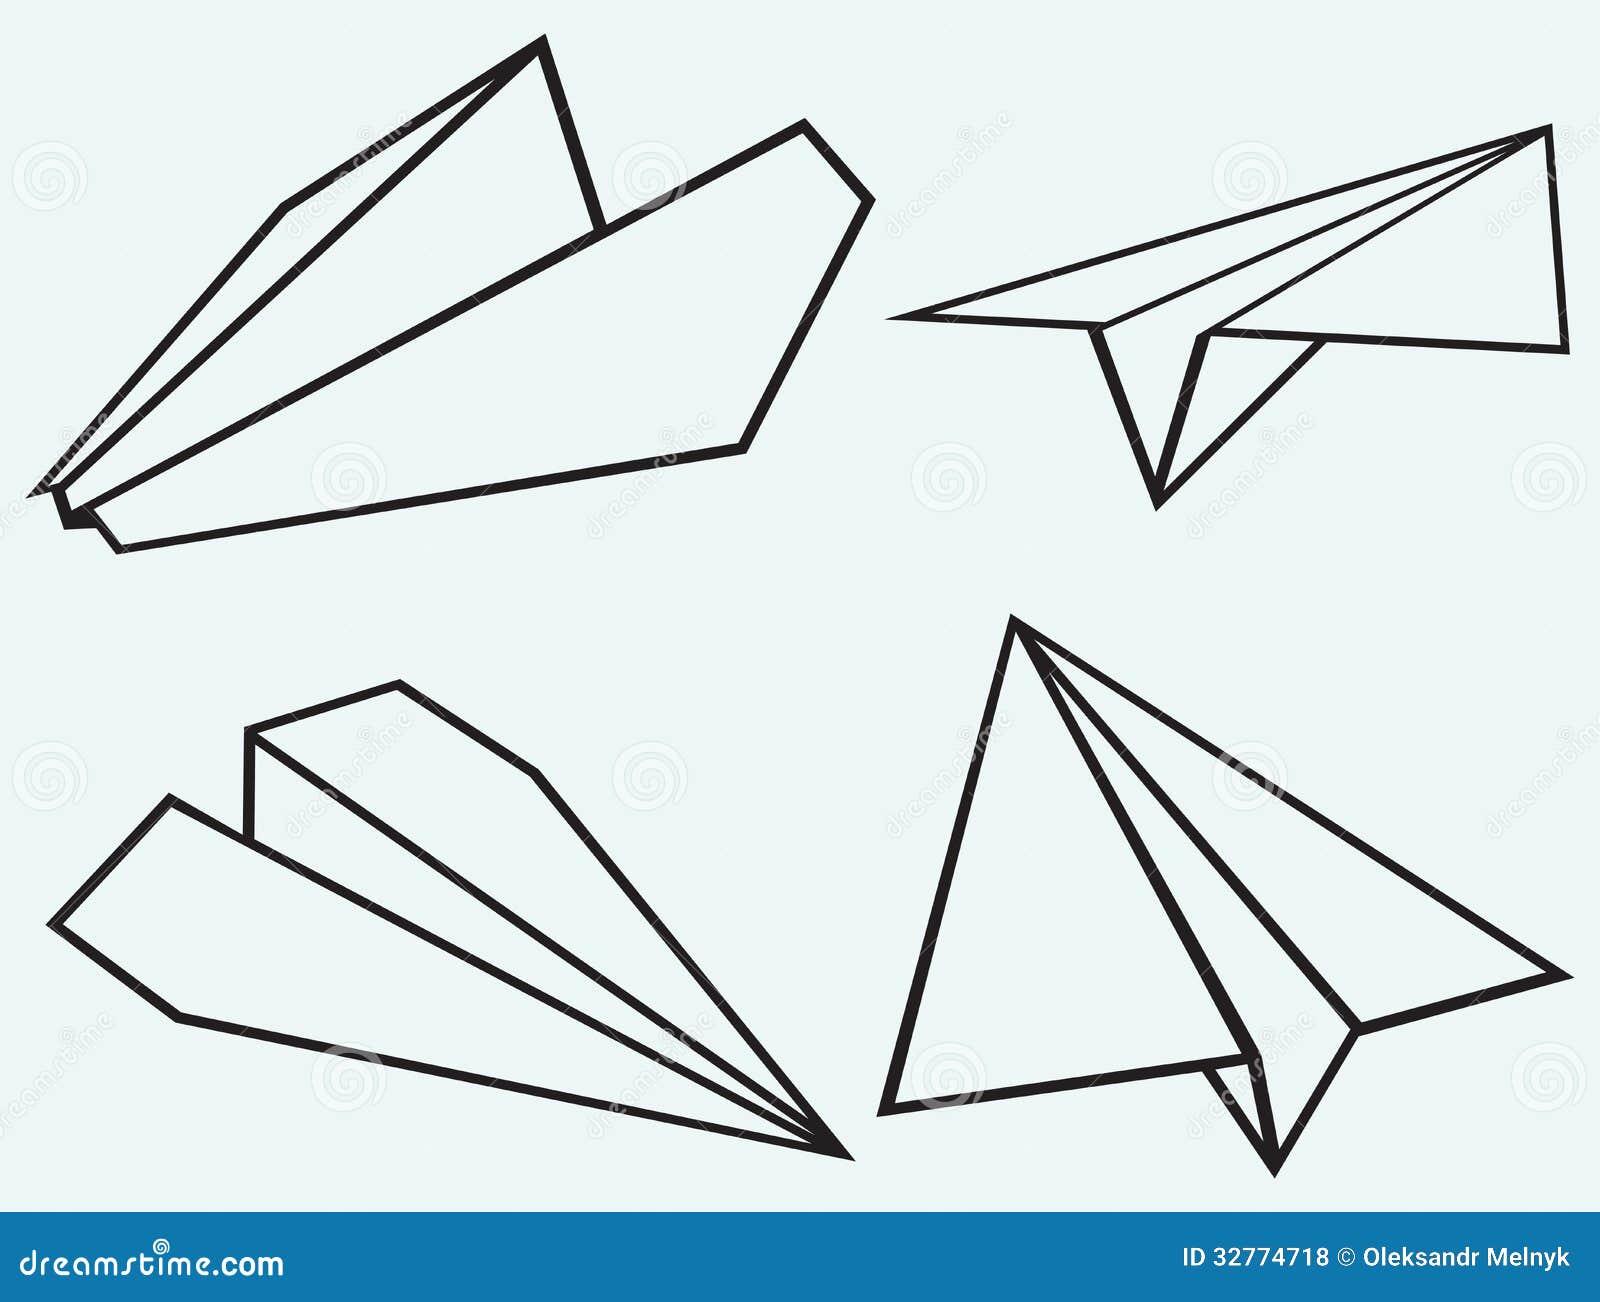 Paper Plane Royalty Free Stock Photos Image 32774718